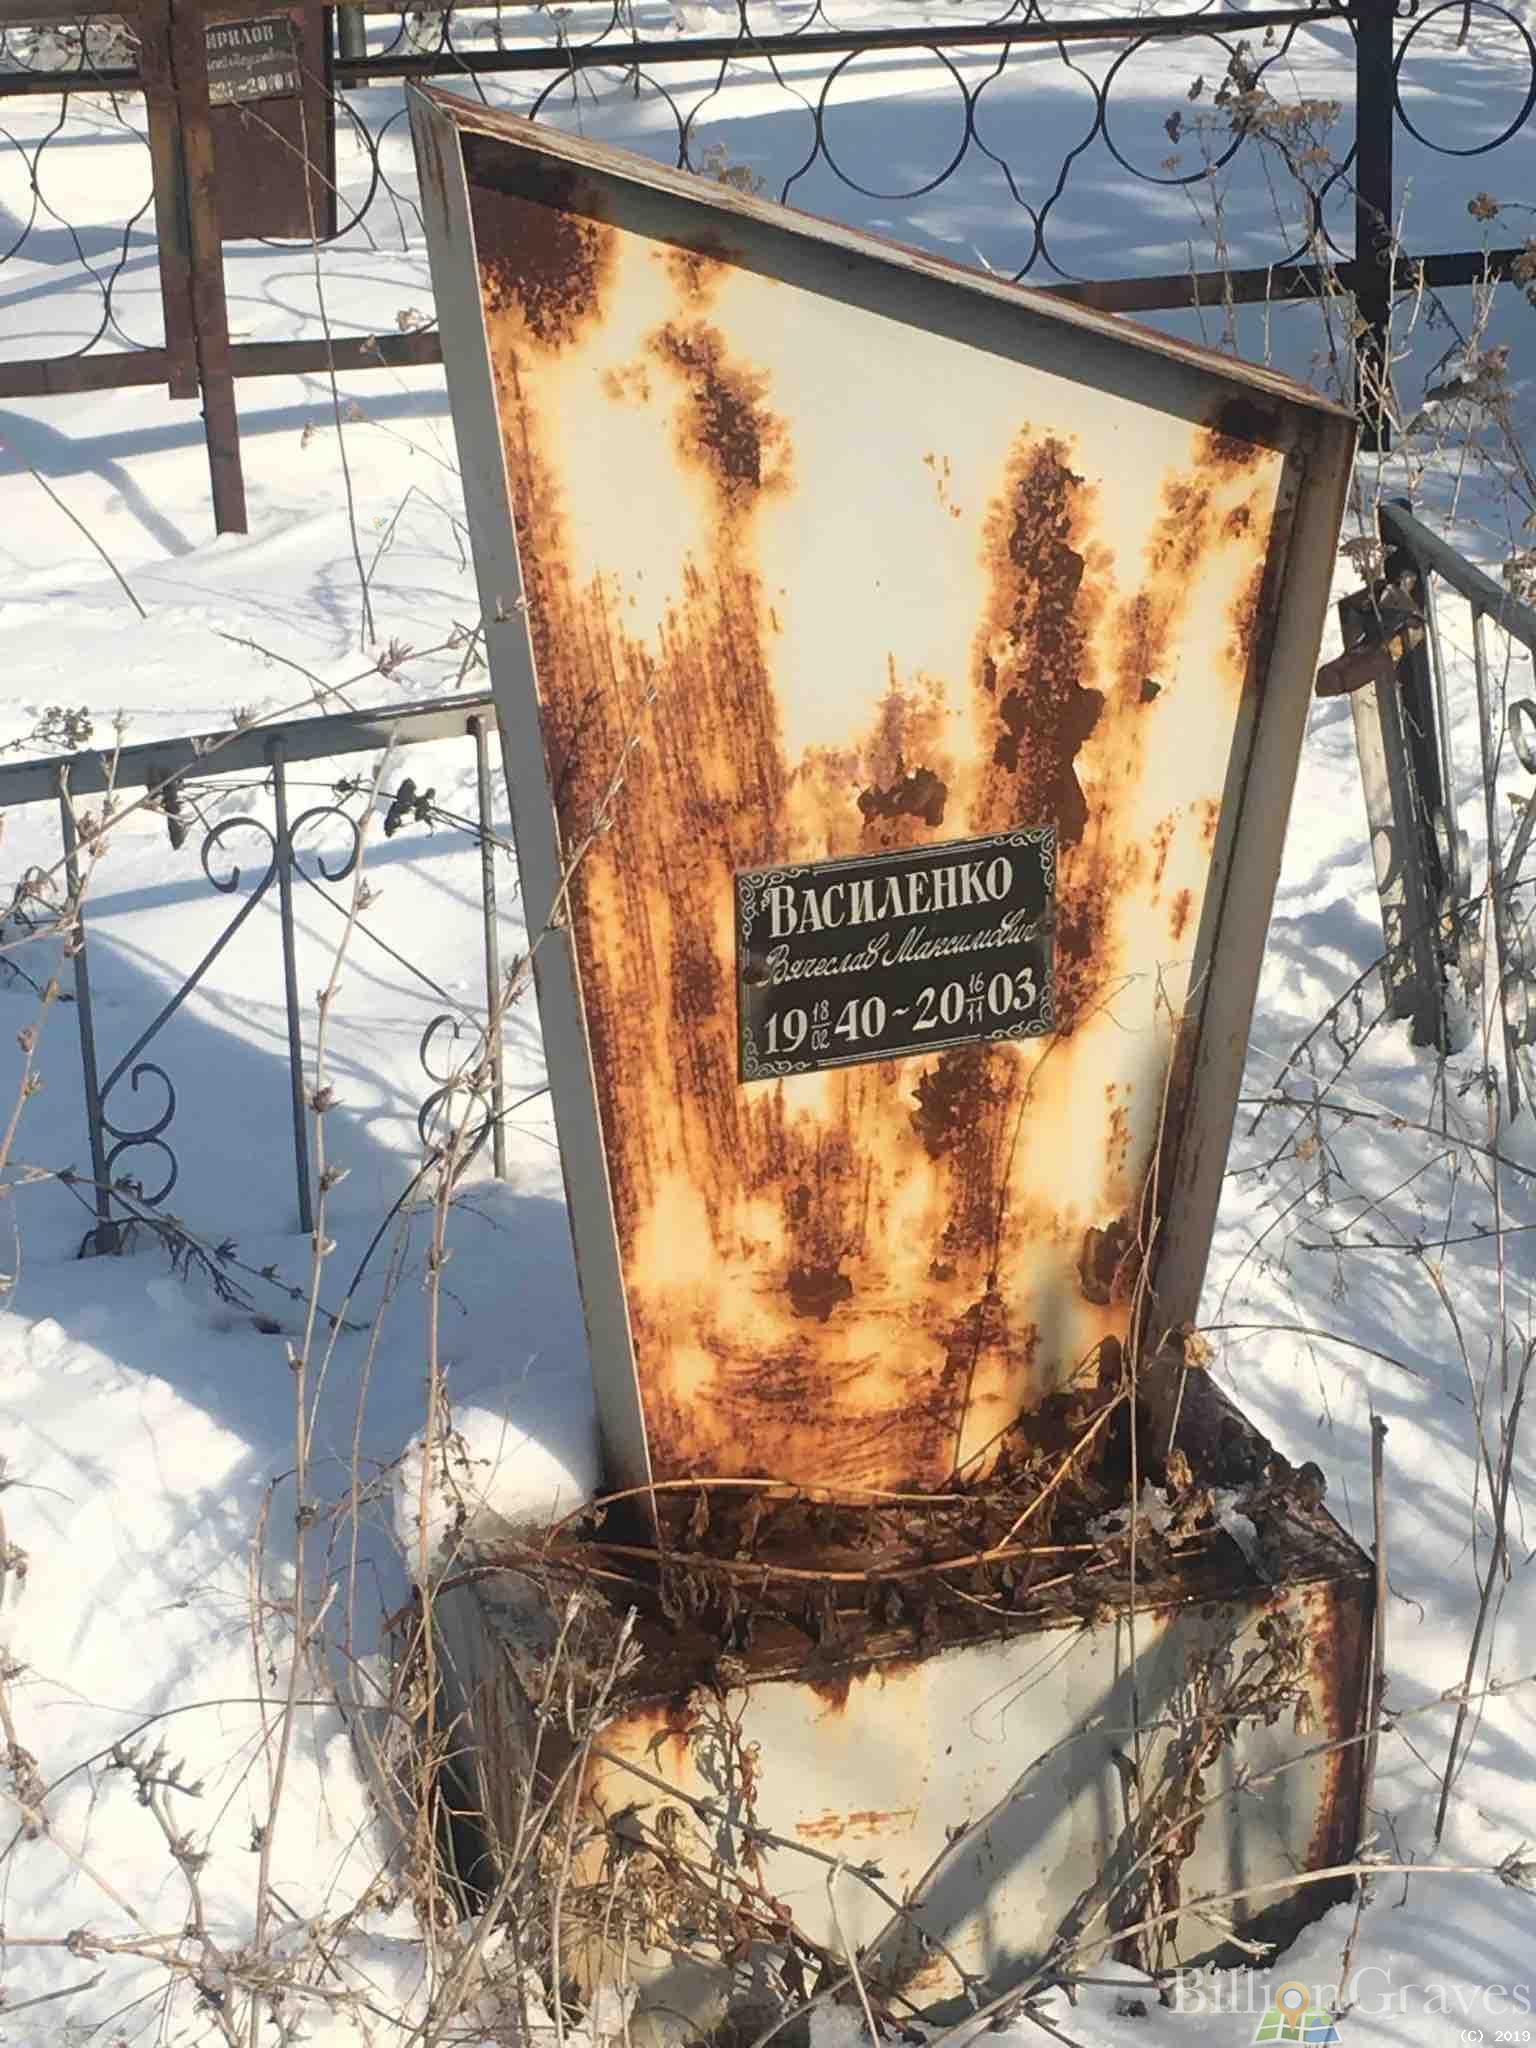 rust, BillionGraves, gravestone, grave, damaged gravestones, cemetery, family history, ancestors, community service project, JustServe, BillionGraves app, ivy, plant growth, JustServe, Ukraine